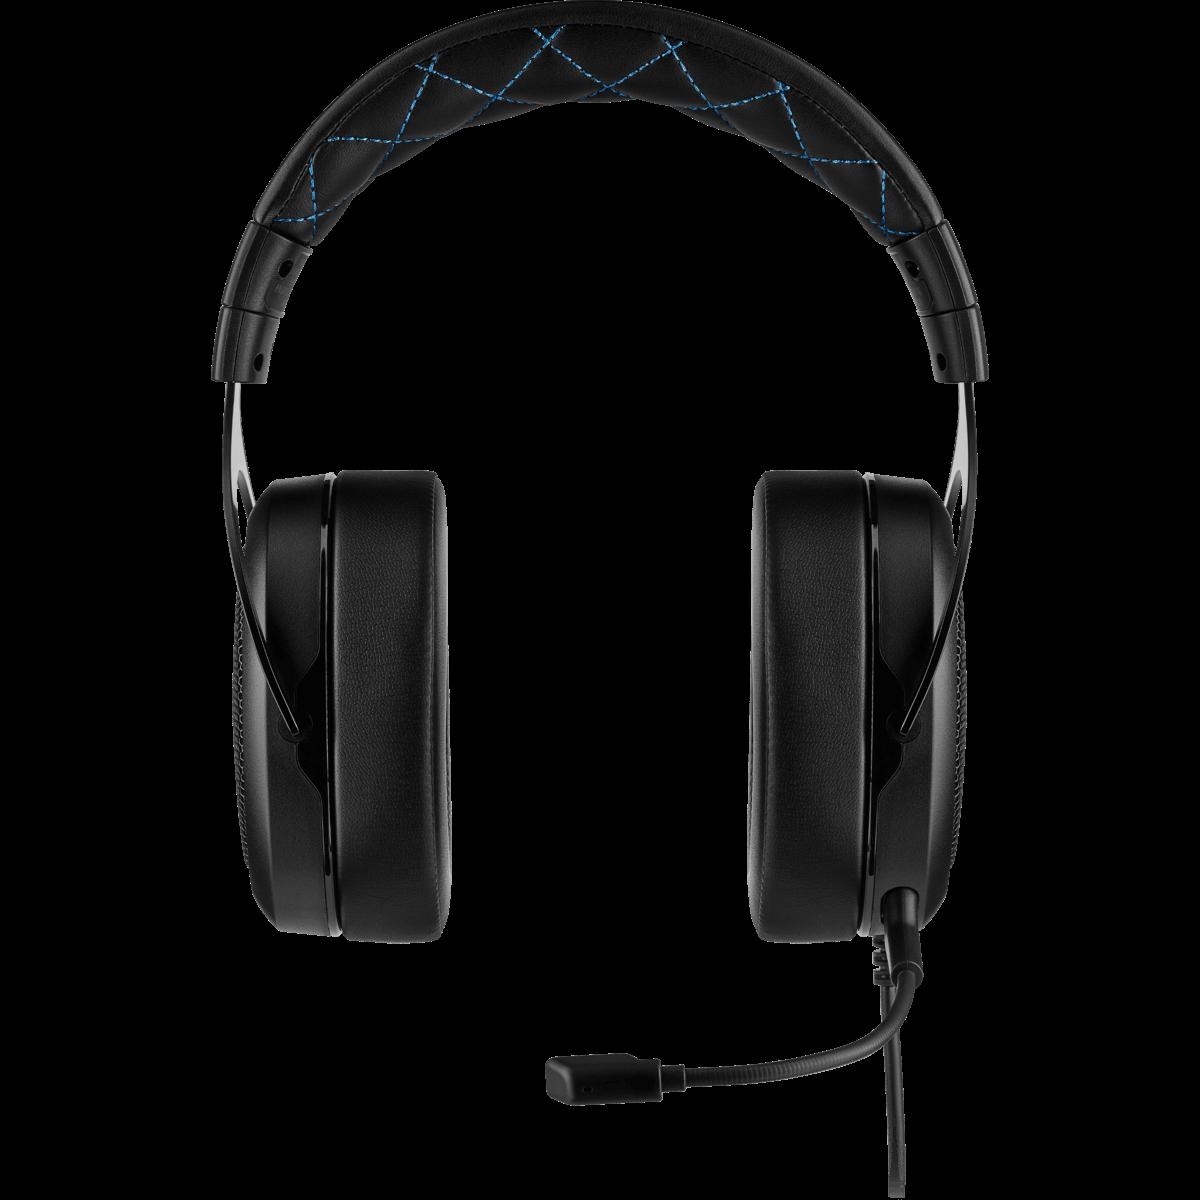 Headset Gamer Corsair HS50 Pro Stereo Blue, CA-9011217-EU